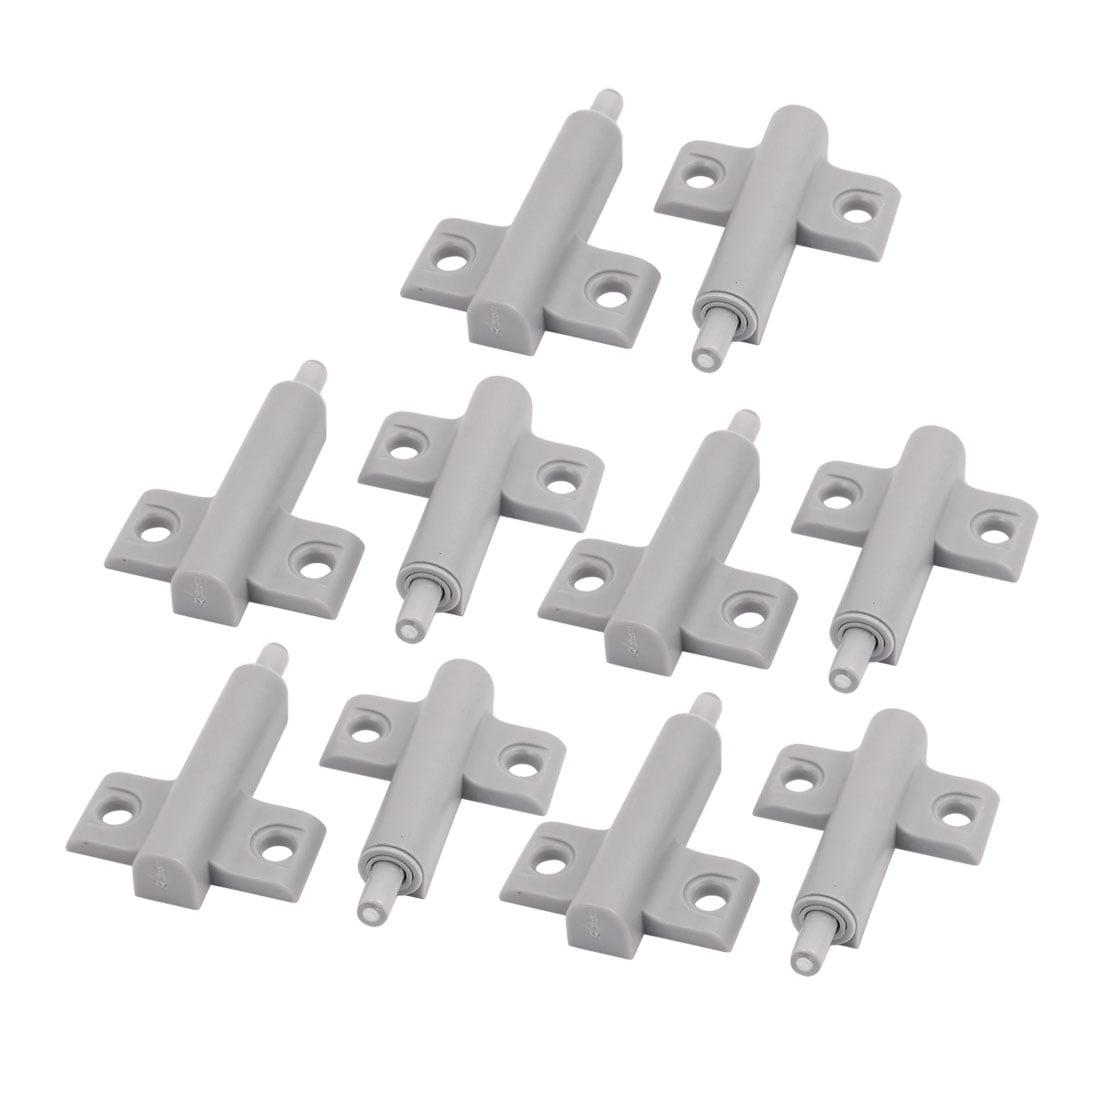 Cupboard Cabinet Drawer Plastic Damper Bumper Closer Buffer Gray 10pcs